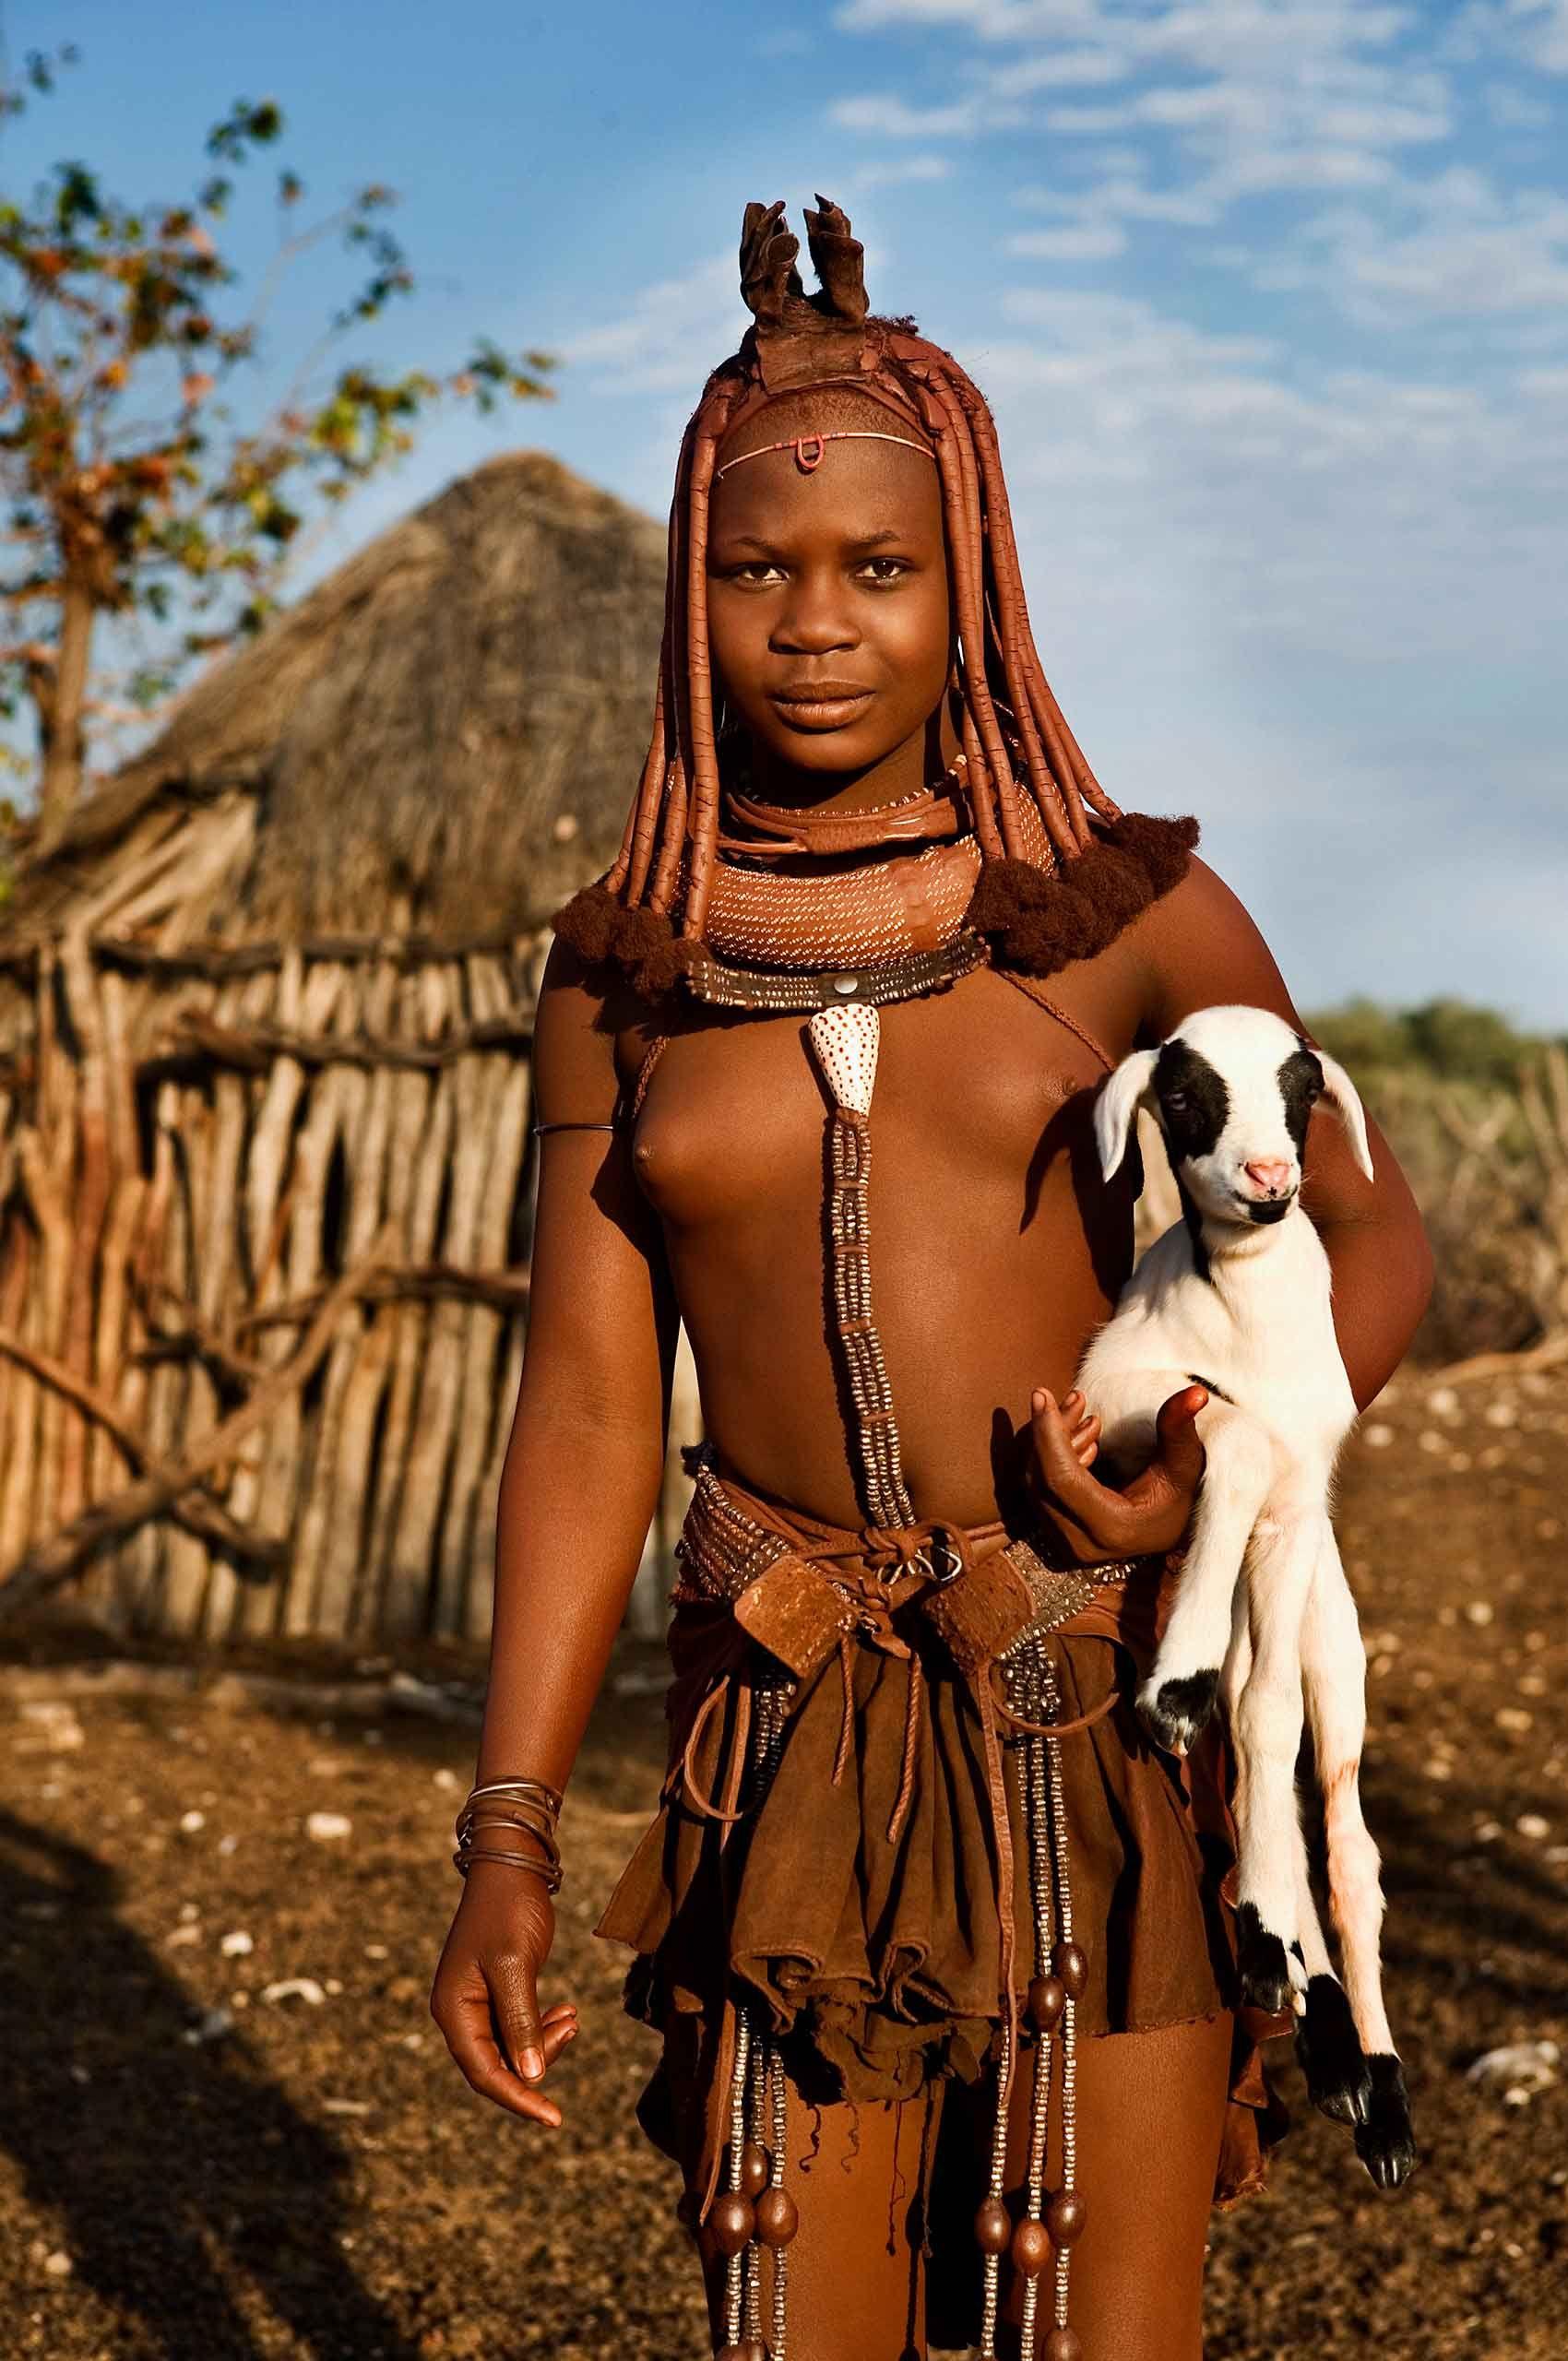 himba-girl-with-lamb-namibia-by-henrikolundphotography.jpg